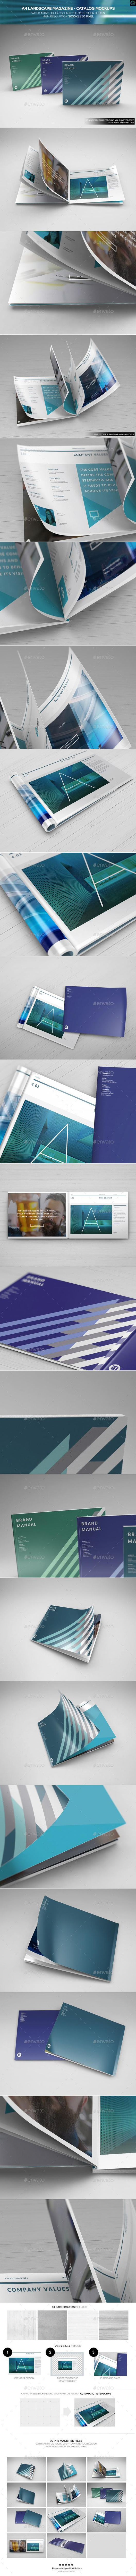 A4 Landscape Magazine - Catalog Mockups - Magazines Print